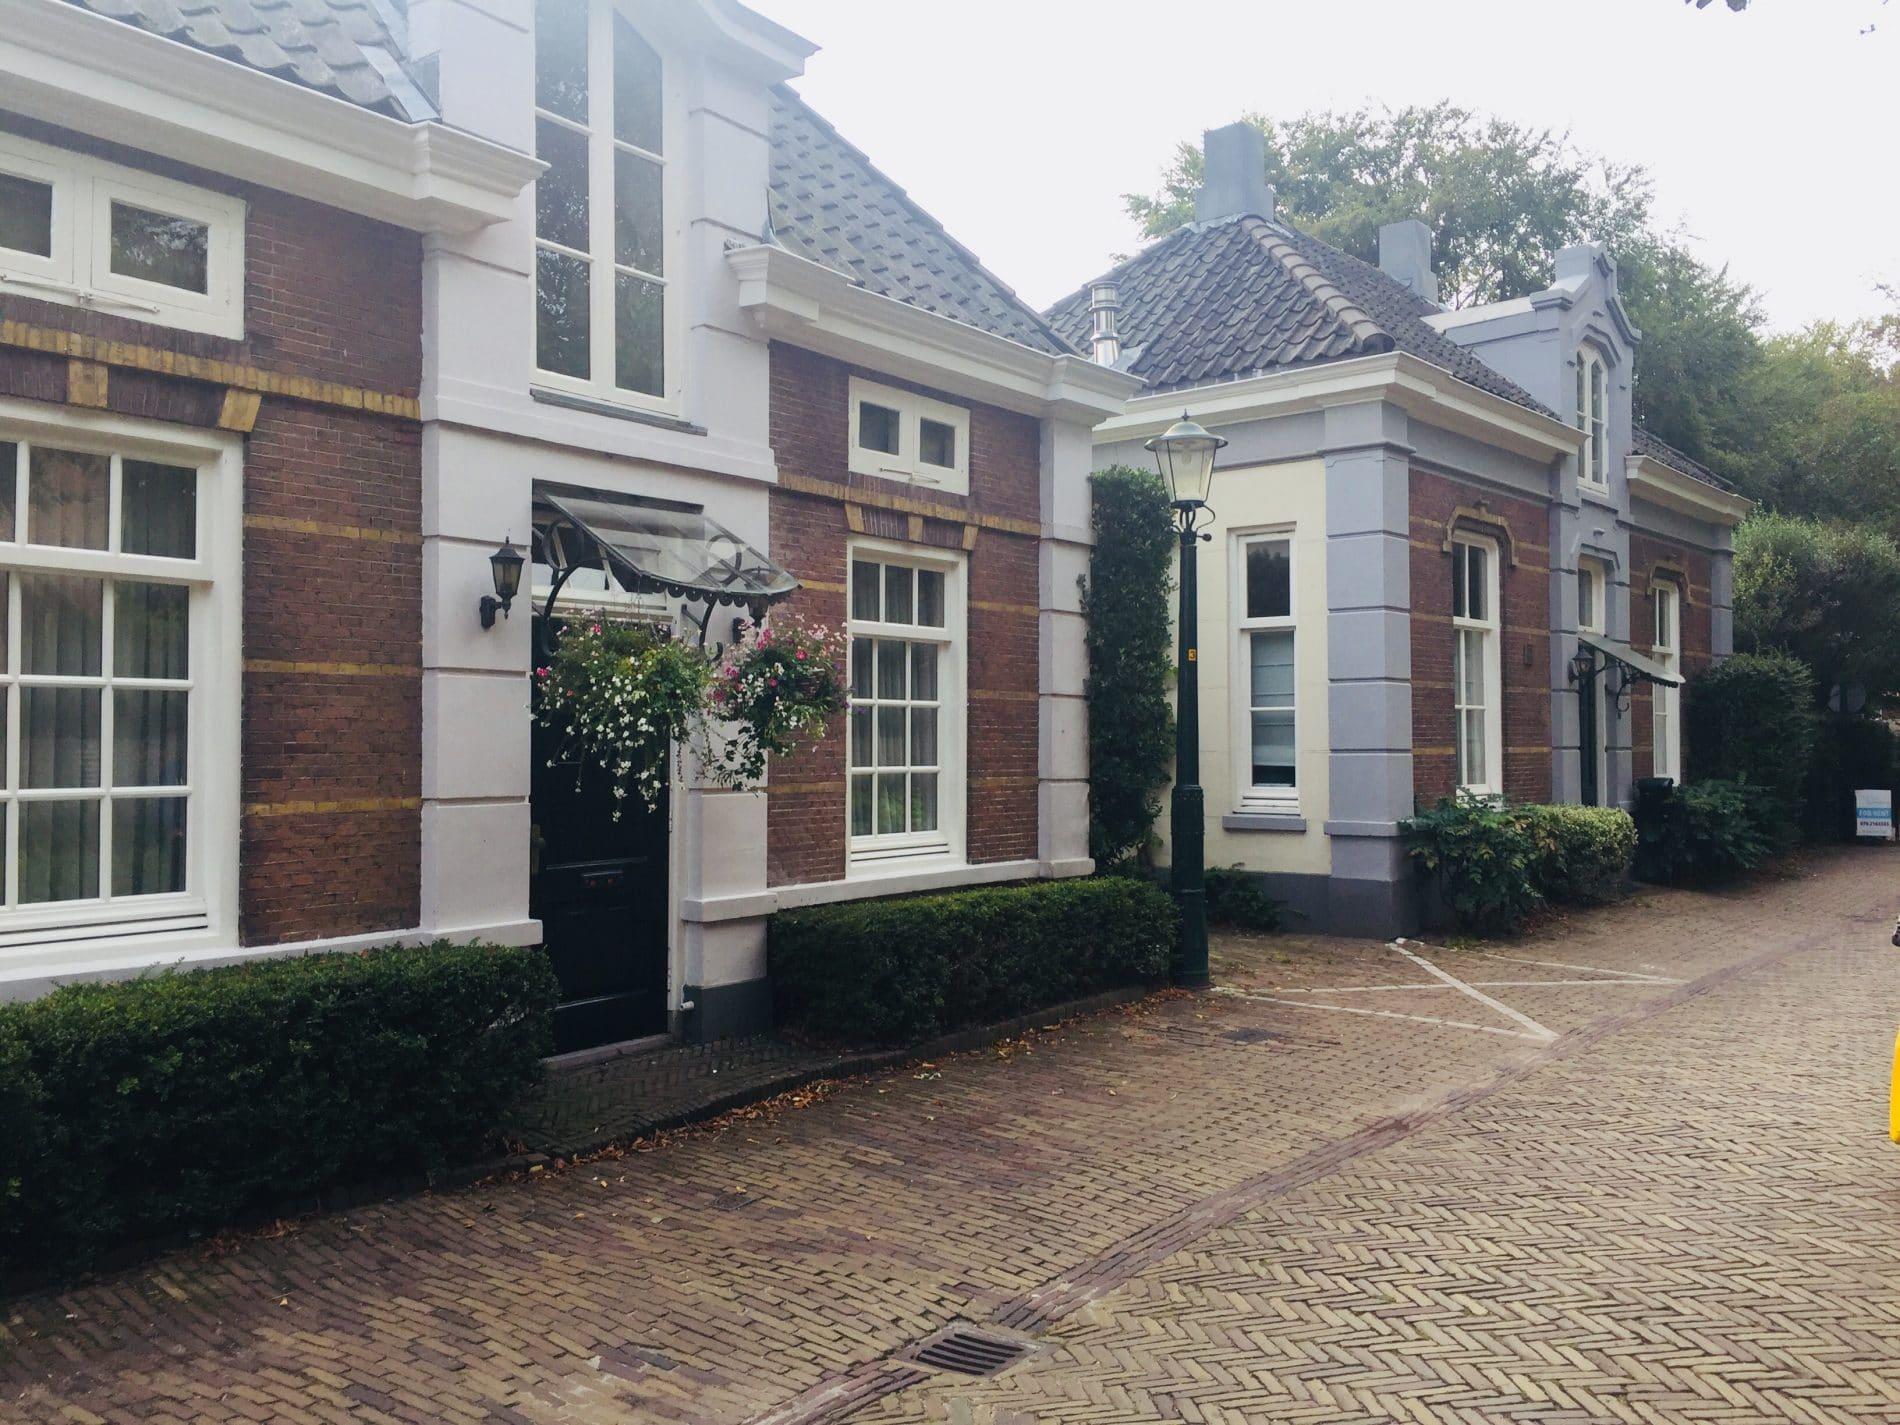 Traditional houses in Wassenaar village